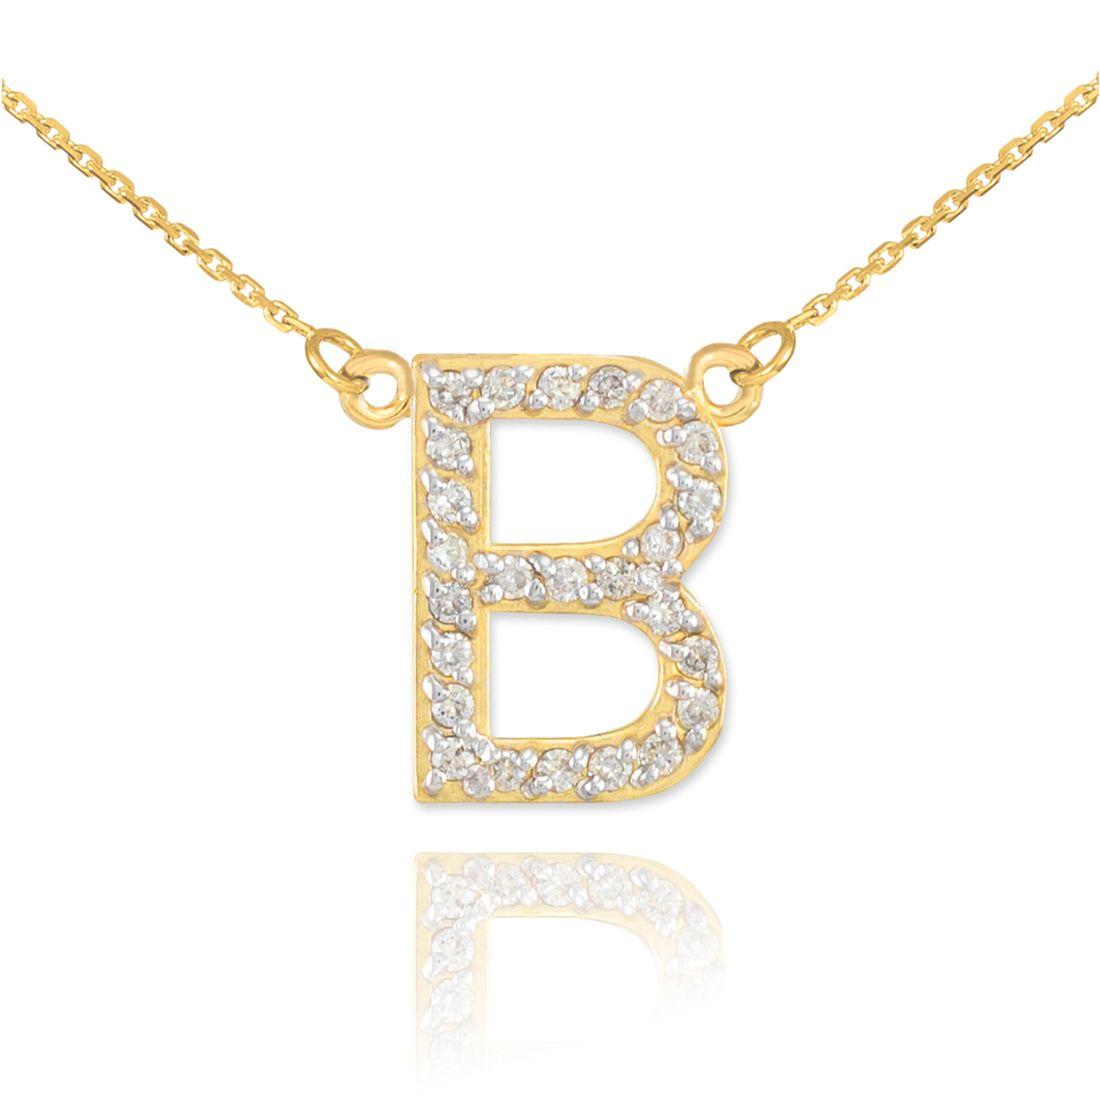 29++ Letter d necklace pendant gold inspirations